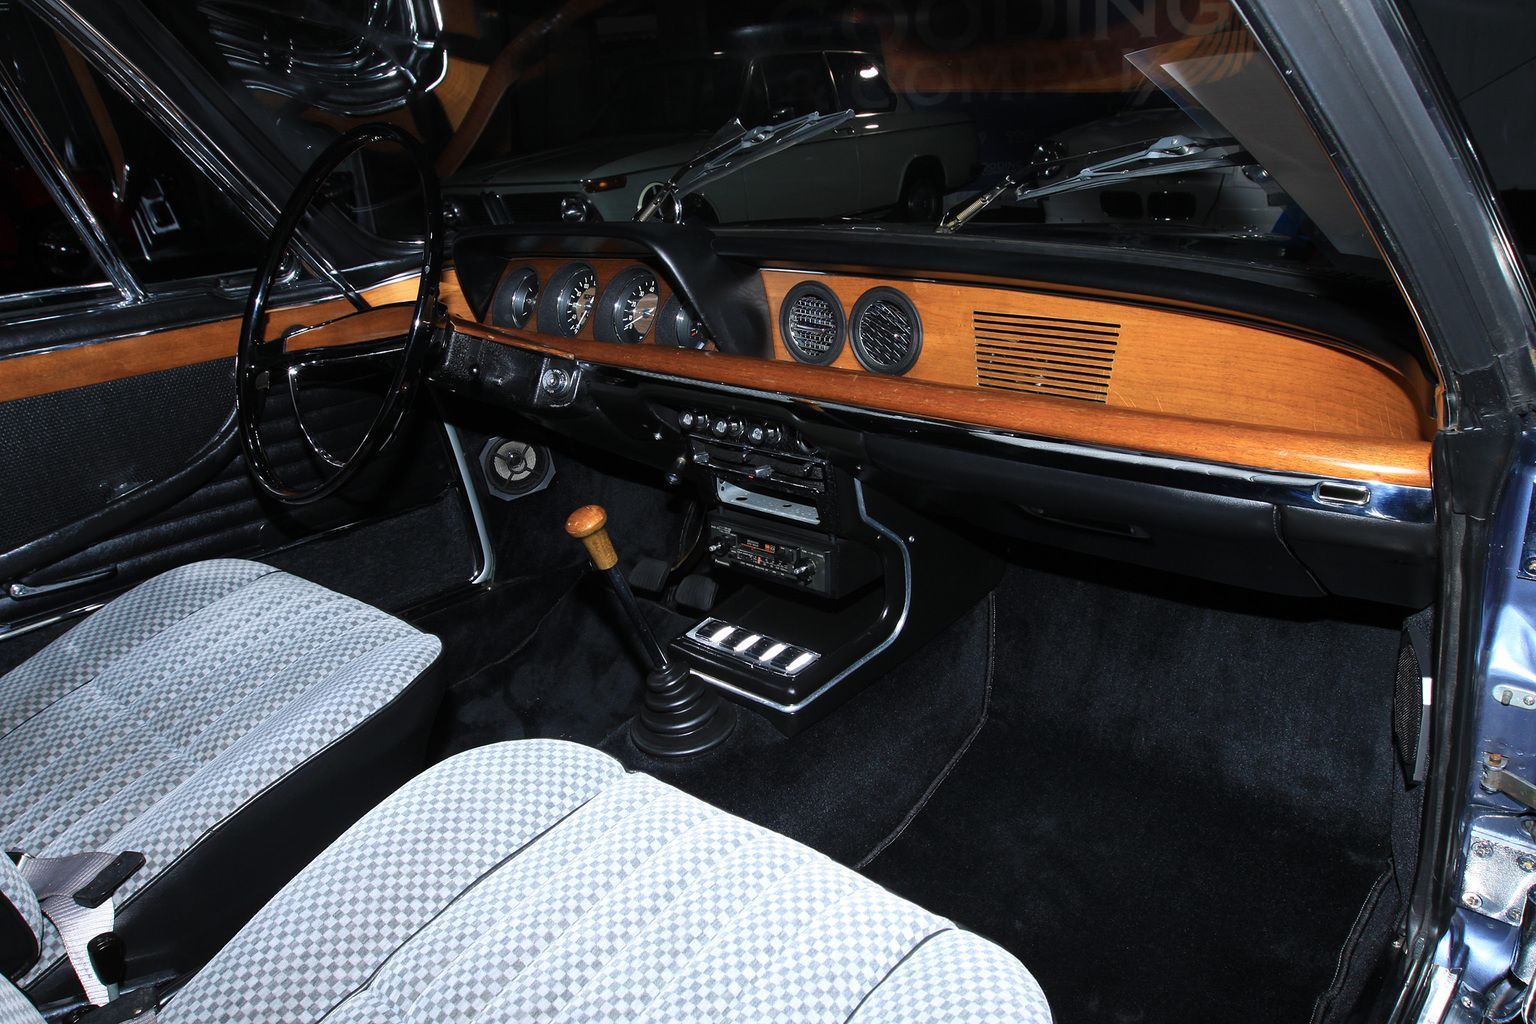 1965 BMW 2000 CS Gallery | Pinterest | BMW, Car interiors and Wheels